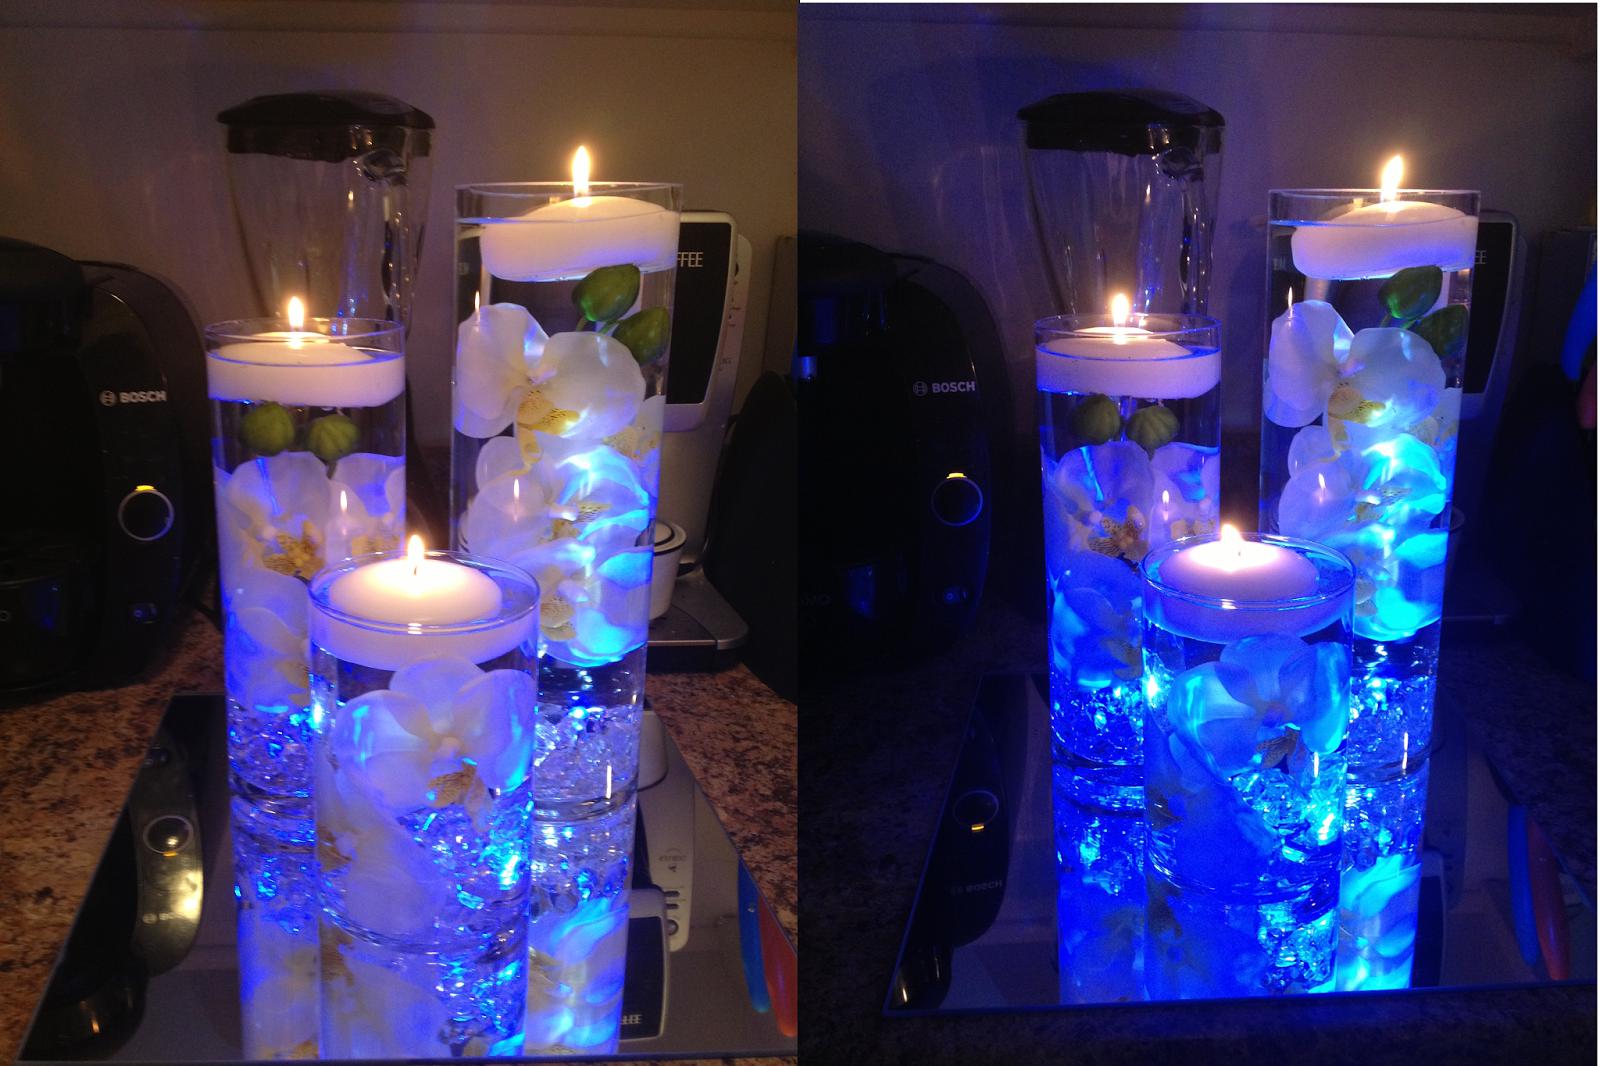 Lighted Wedding Centerpiece Ideas Wedding Centerpieces With Lights Uxwopgi Lighted Centerpieces Lighted Wedding Centerpieces Vase With Lights